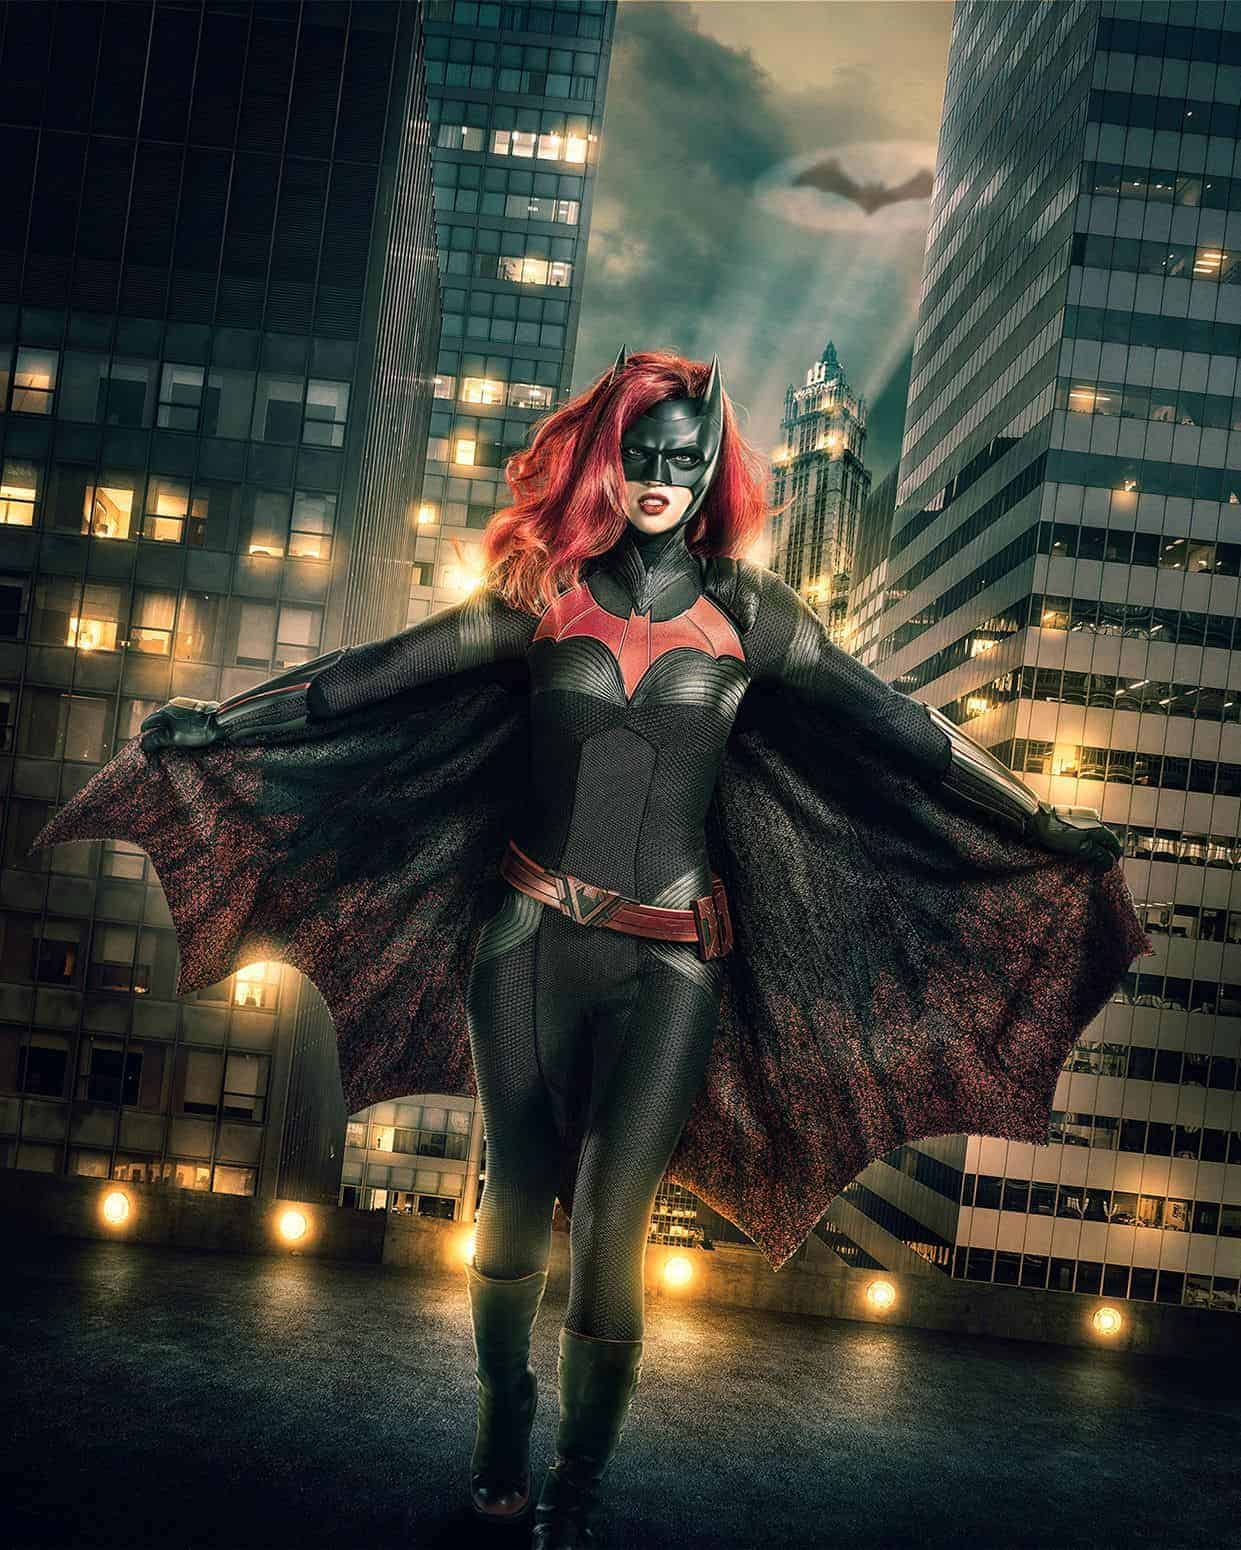 batwoman elseworlds arrowverse ruby rose first look 1138082 - La primera imagen de Ruby Rose como Batwoman ya está aquí